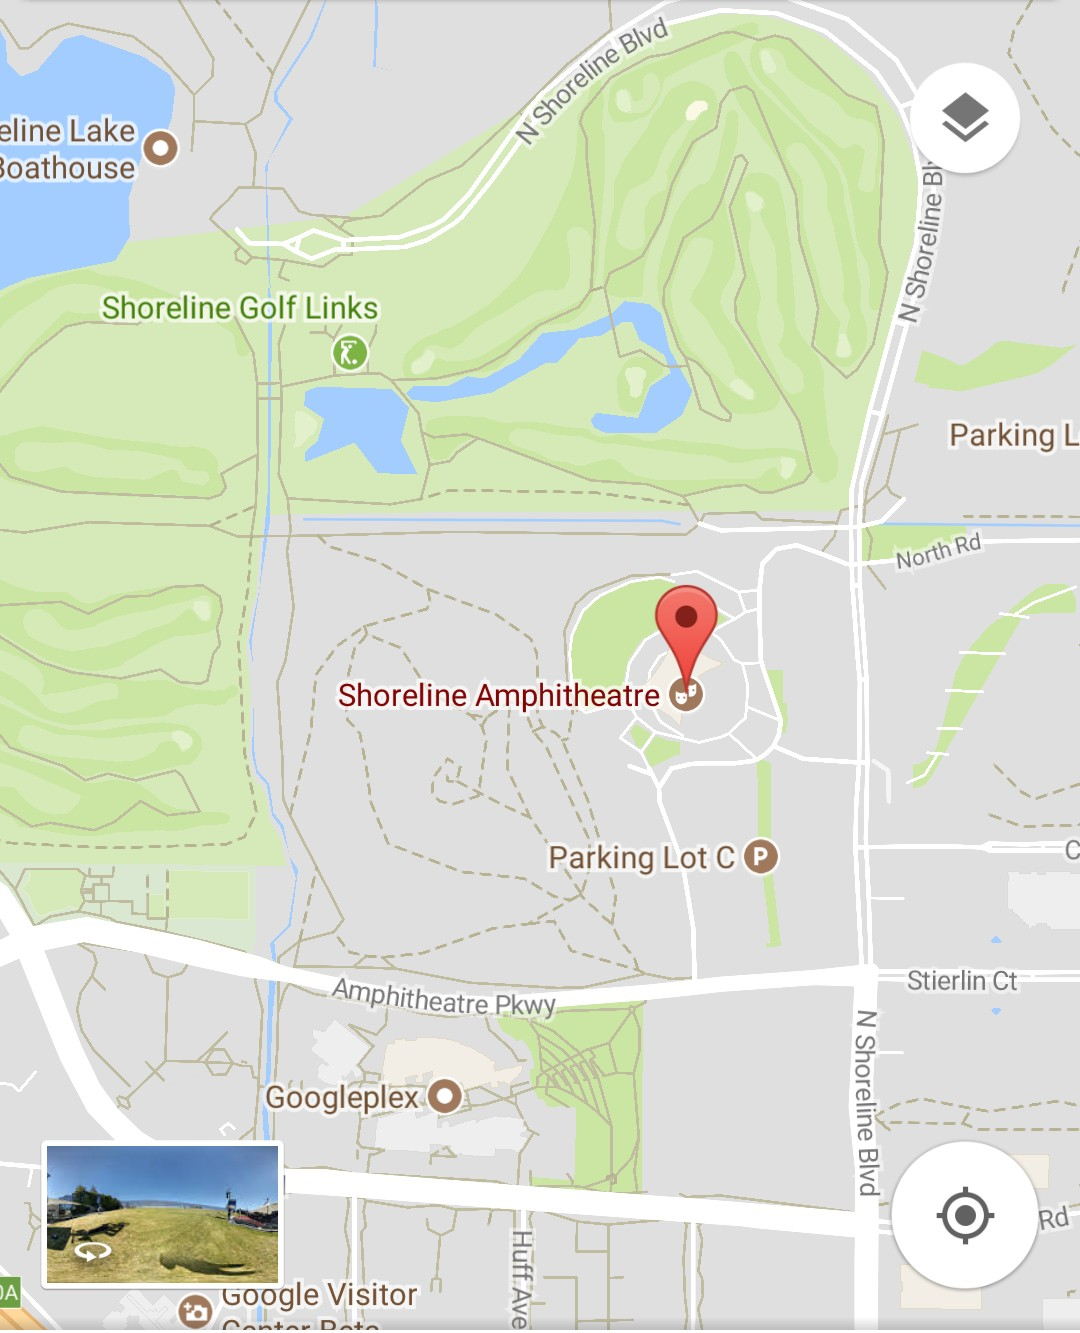 Google I/O 2018 Event Location On Maps